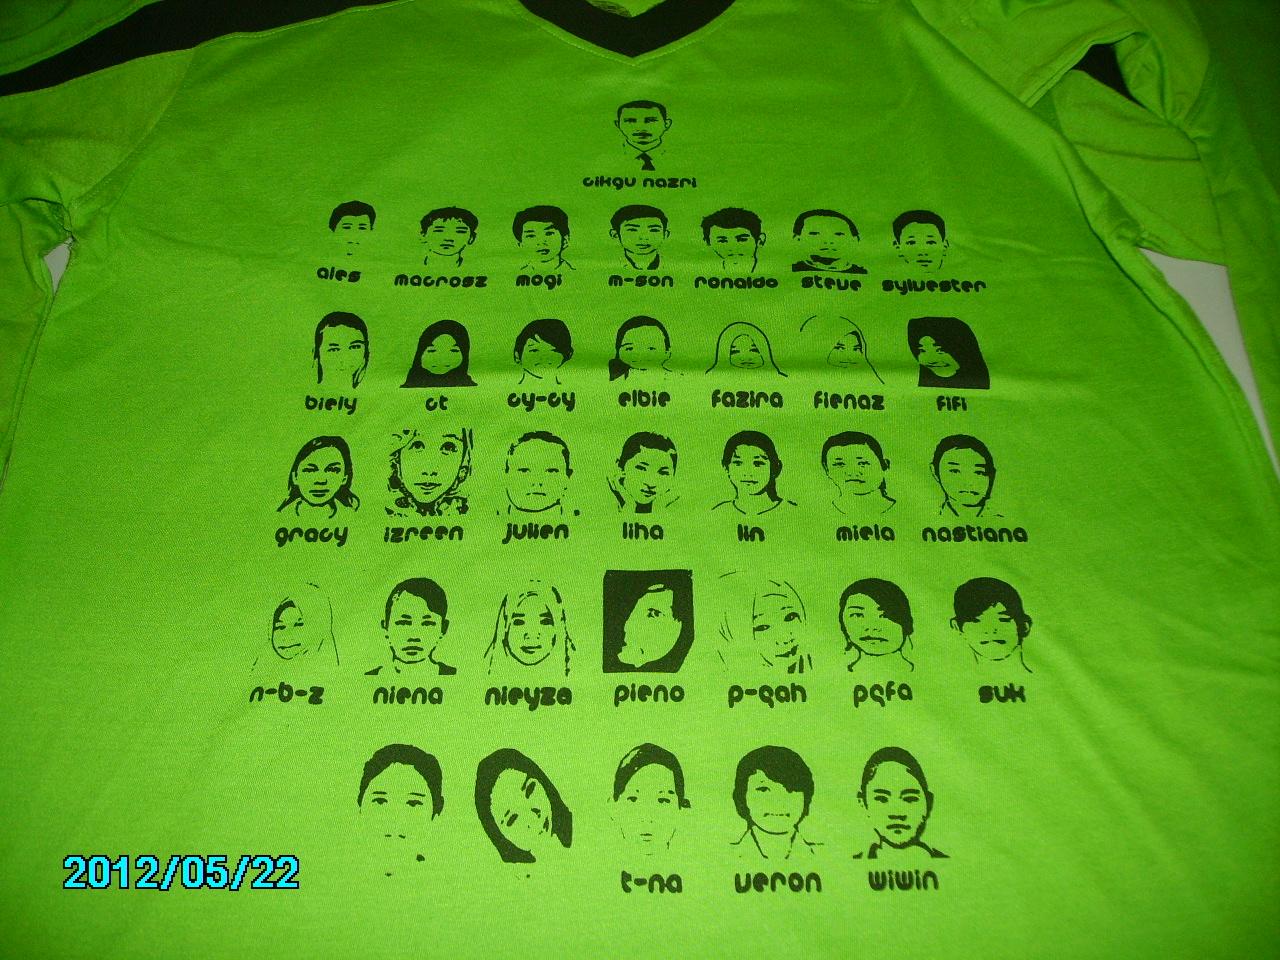 Contoh design tshirt kelas - T Shirt Kelas